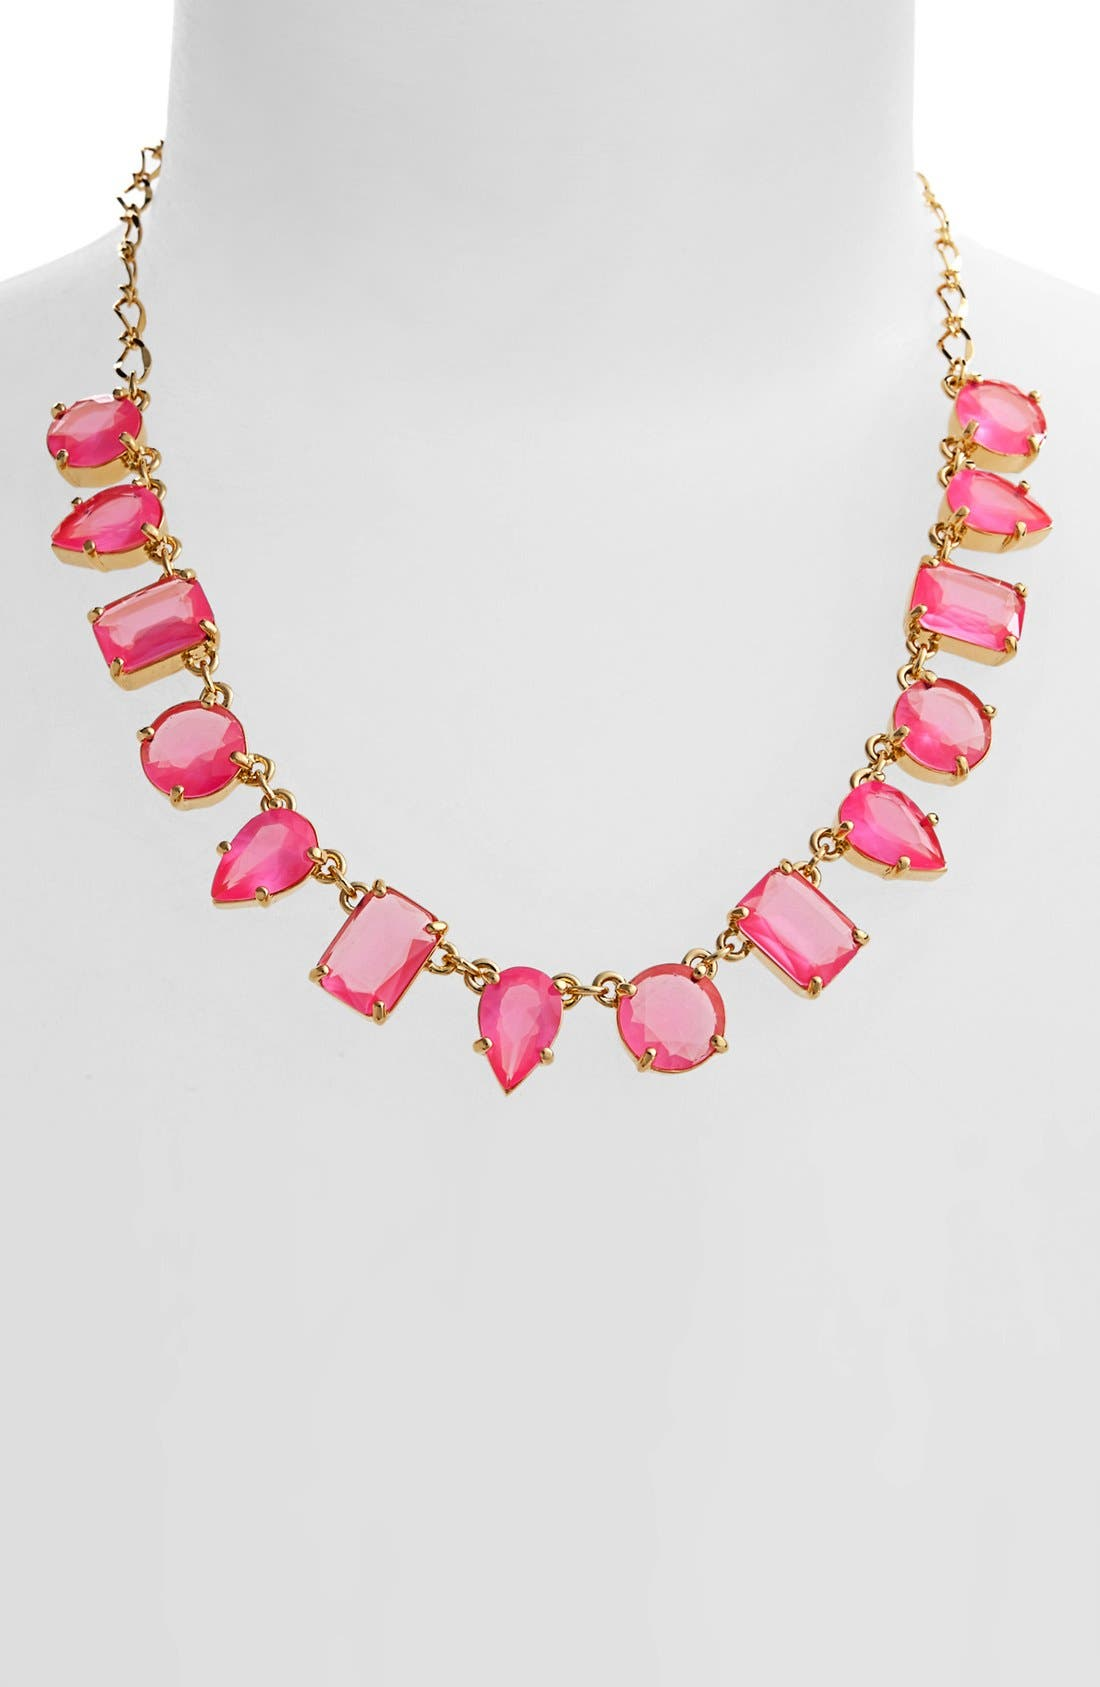 Main Image - kate spade new york 'gumdrop gems' stone frontal necklace